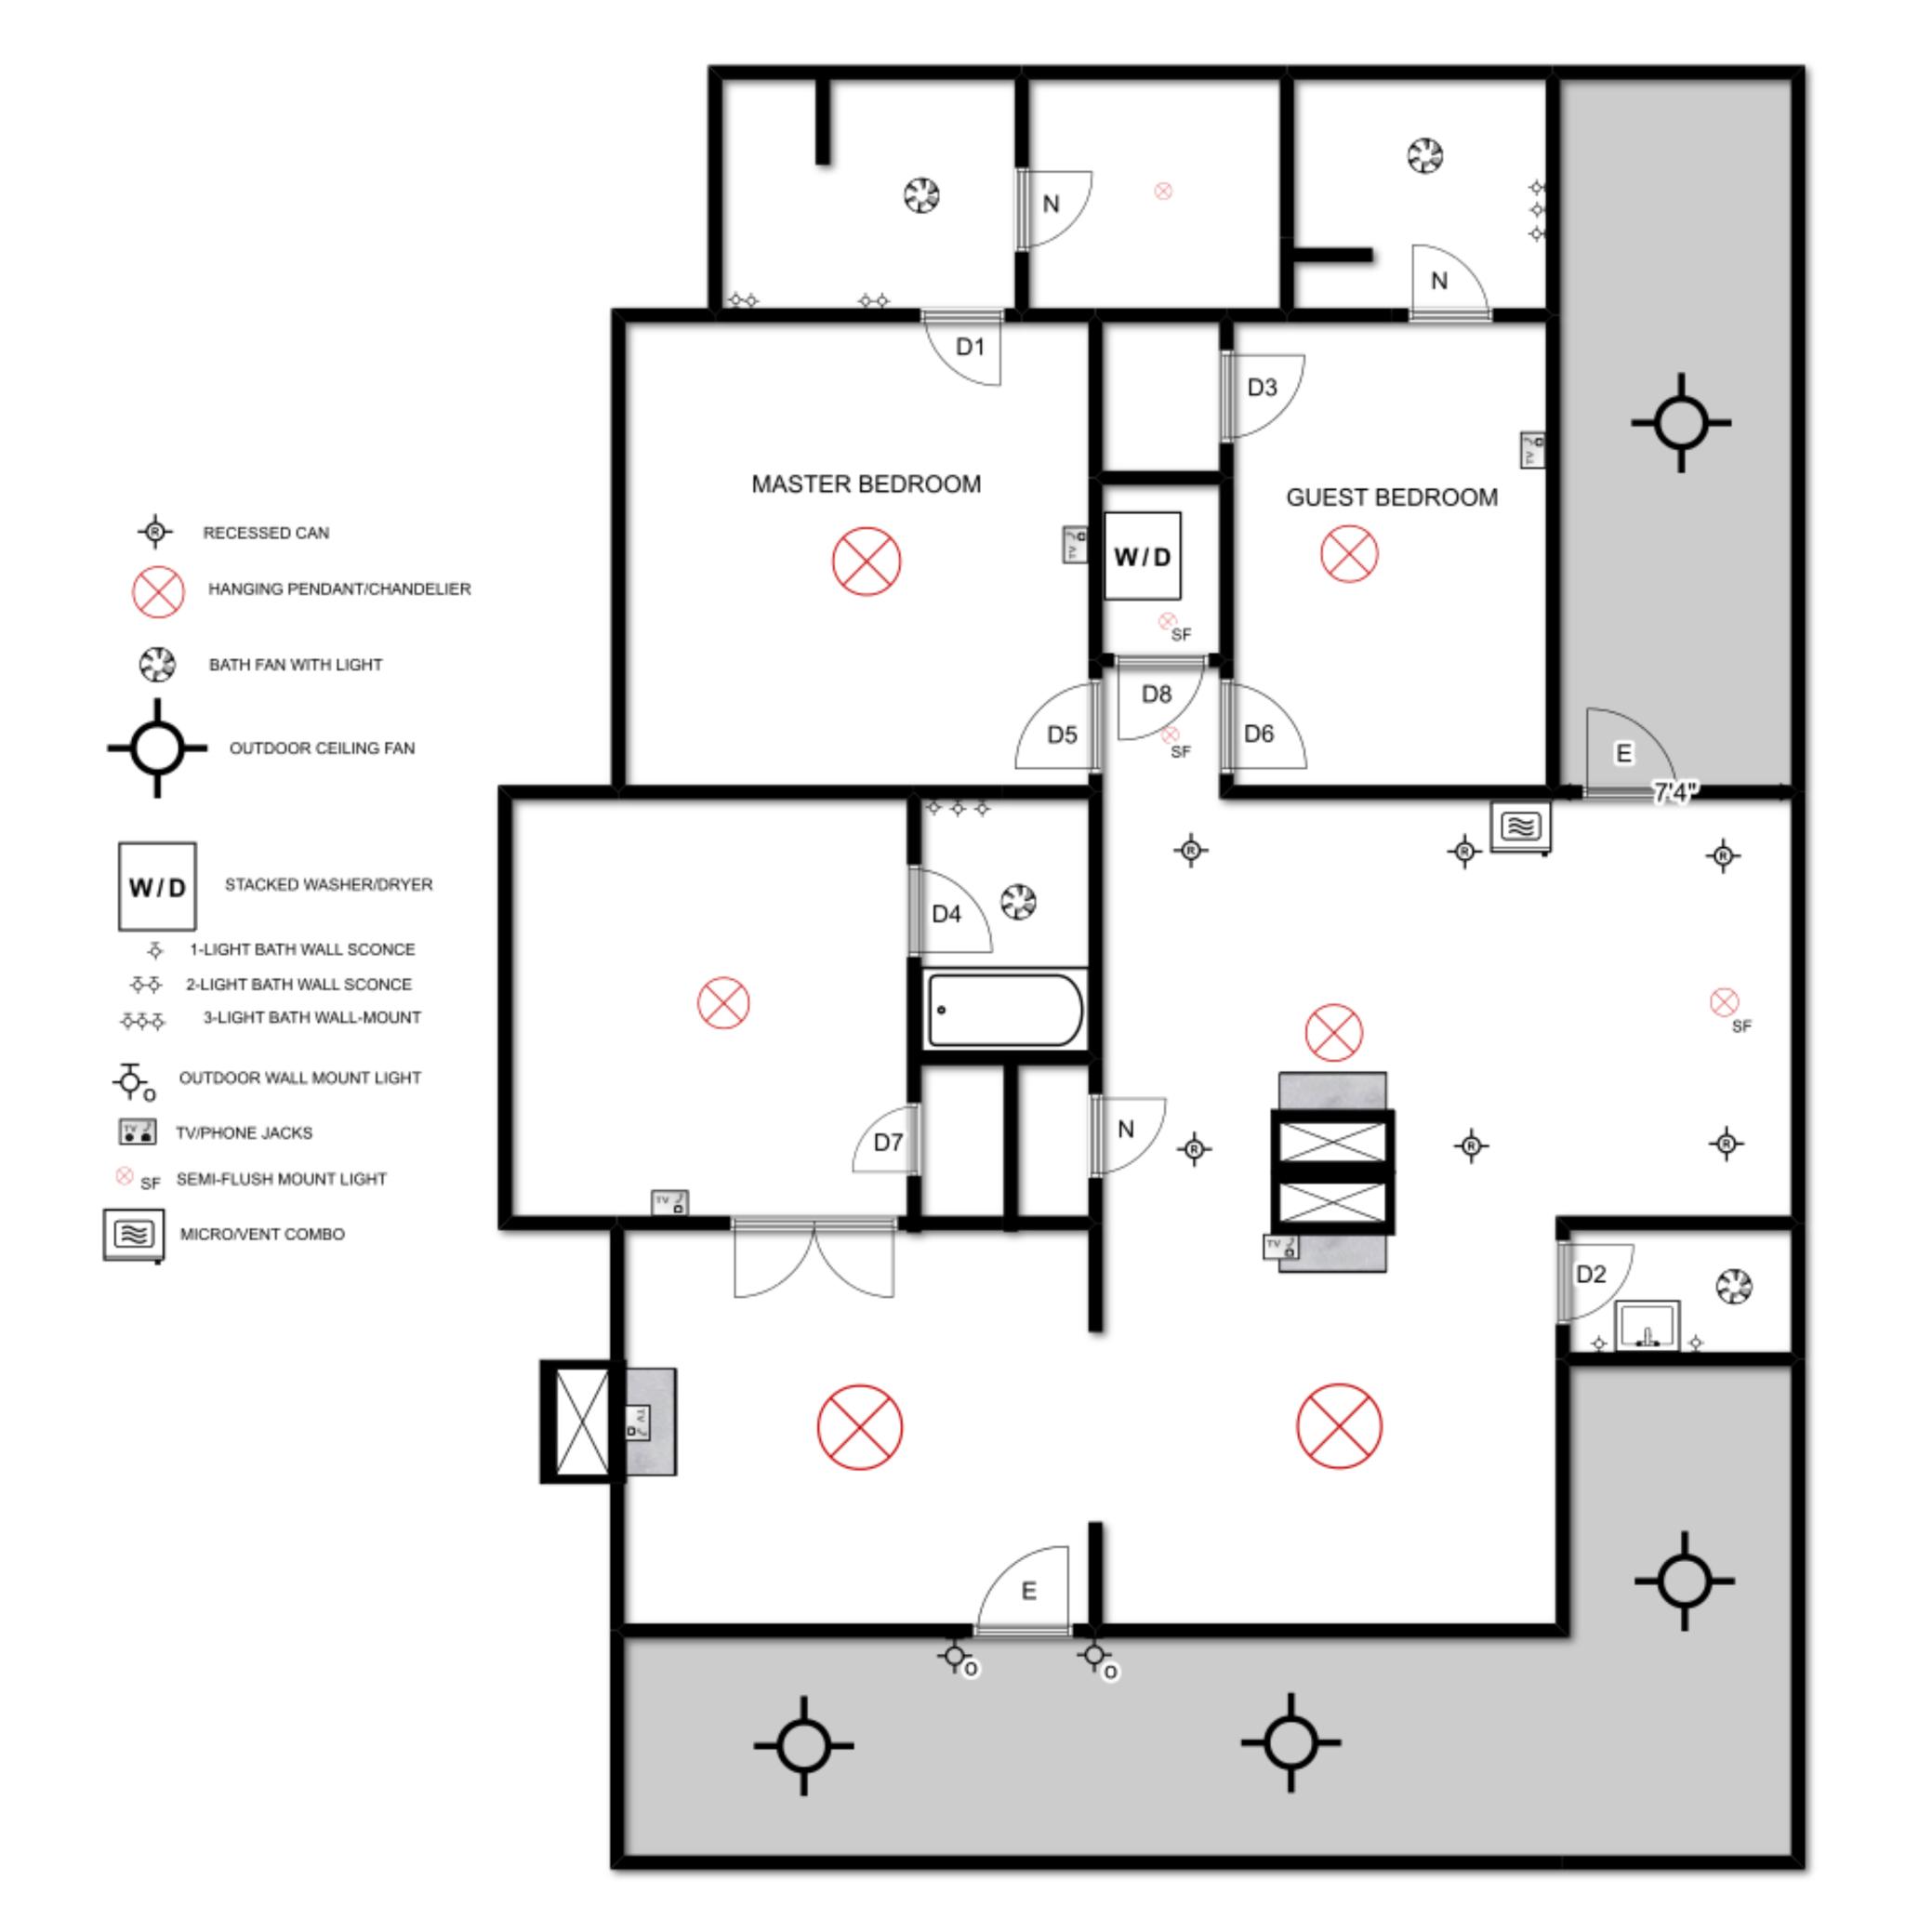 hight resolution of elizabeth burns design electrical plan format 1500w